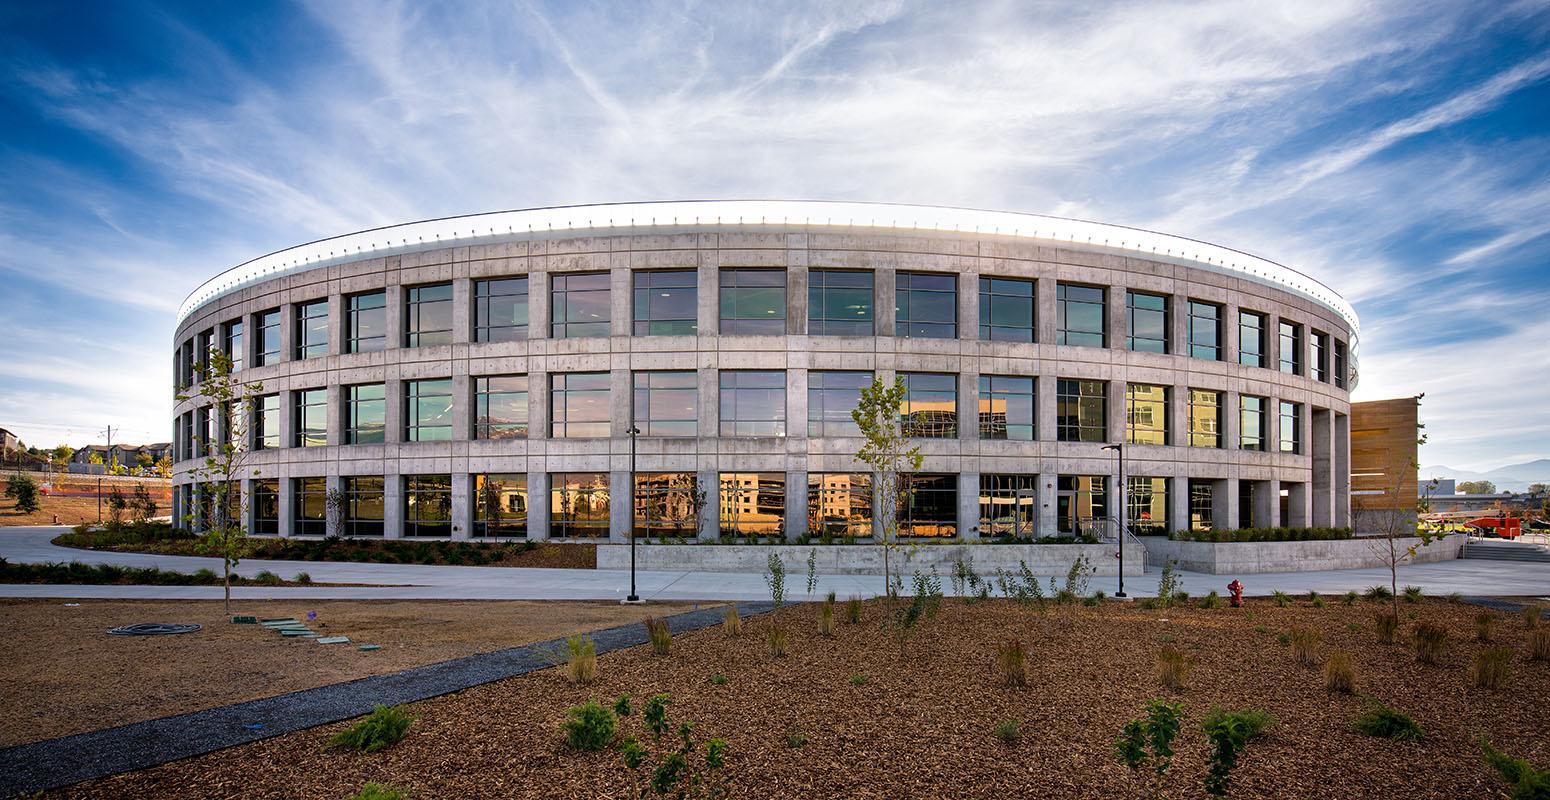 Overstock.com Headquarters, Parking Structure & Data Center (2016)